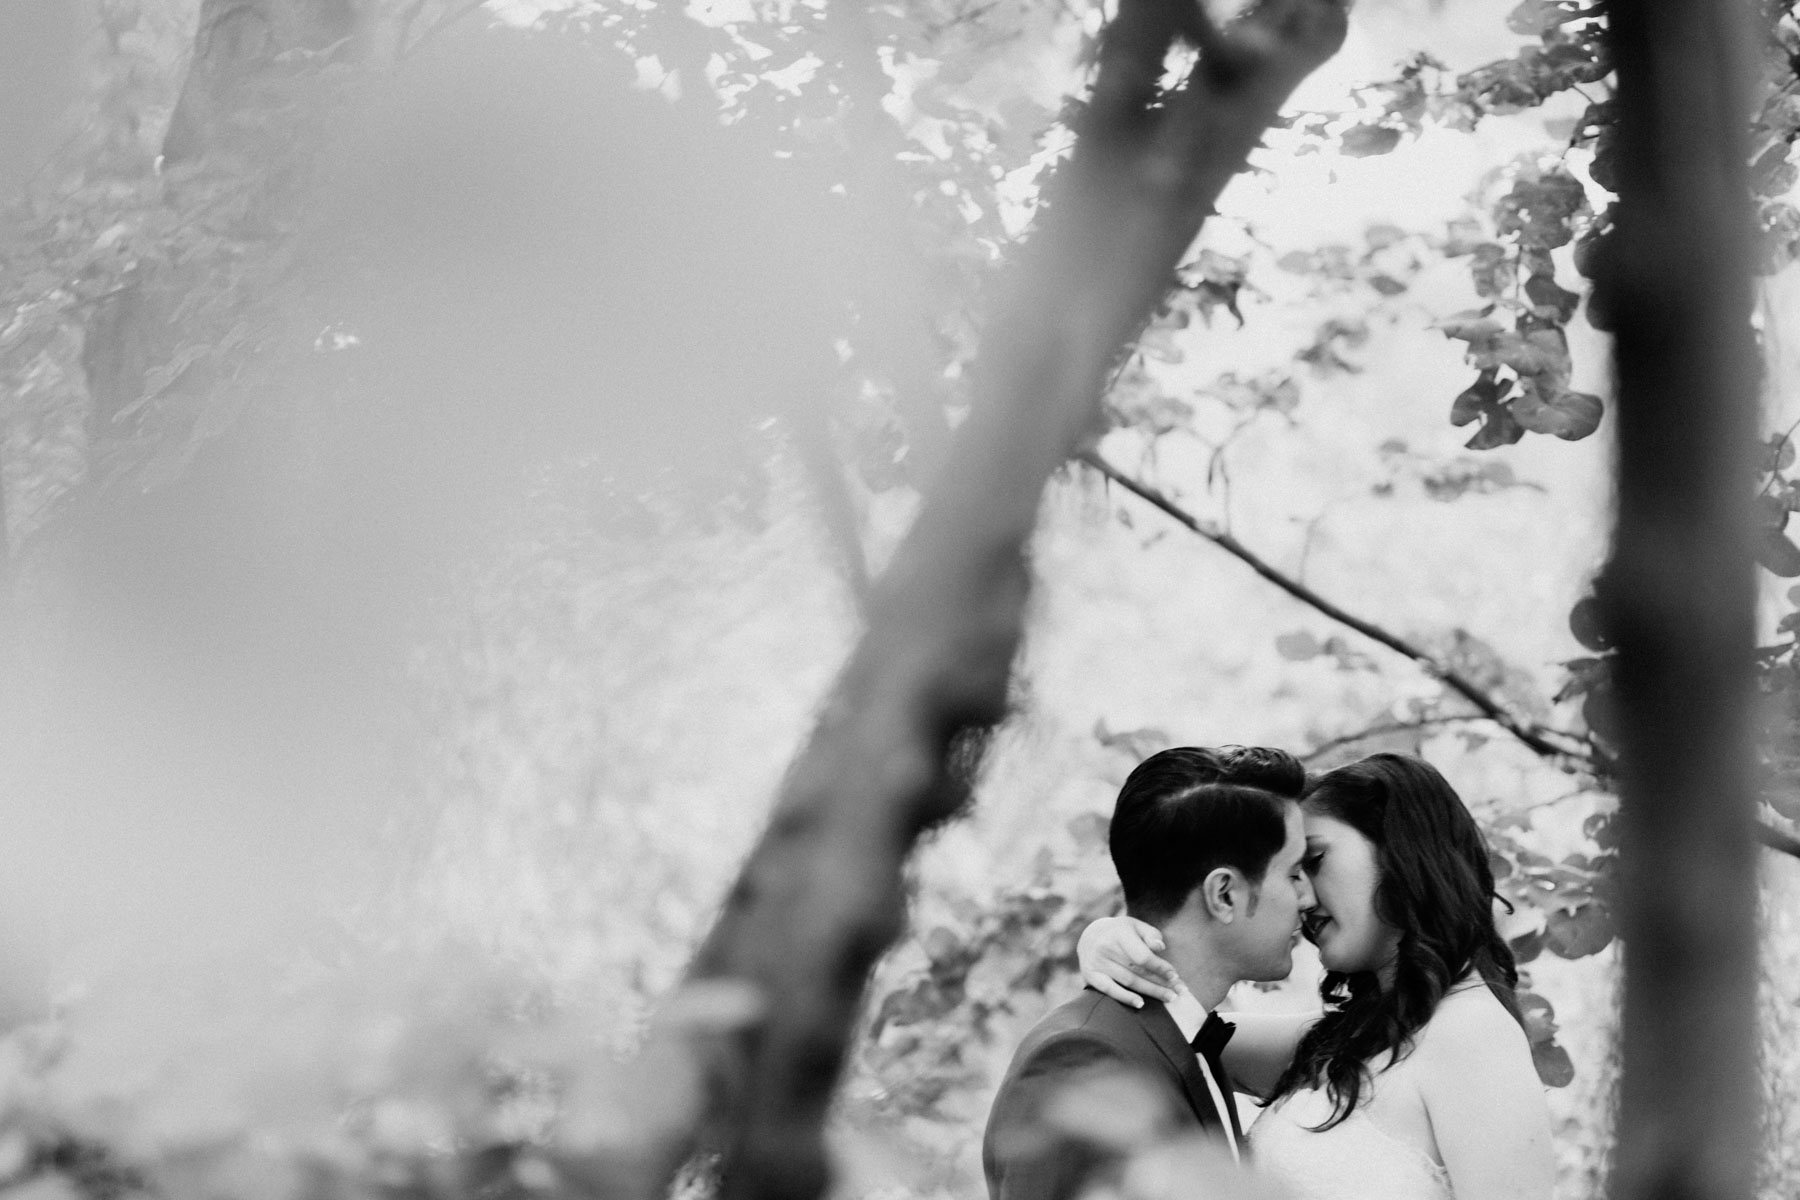 fotografo de bodas Jairo Crena-79